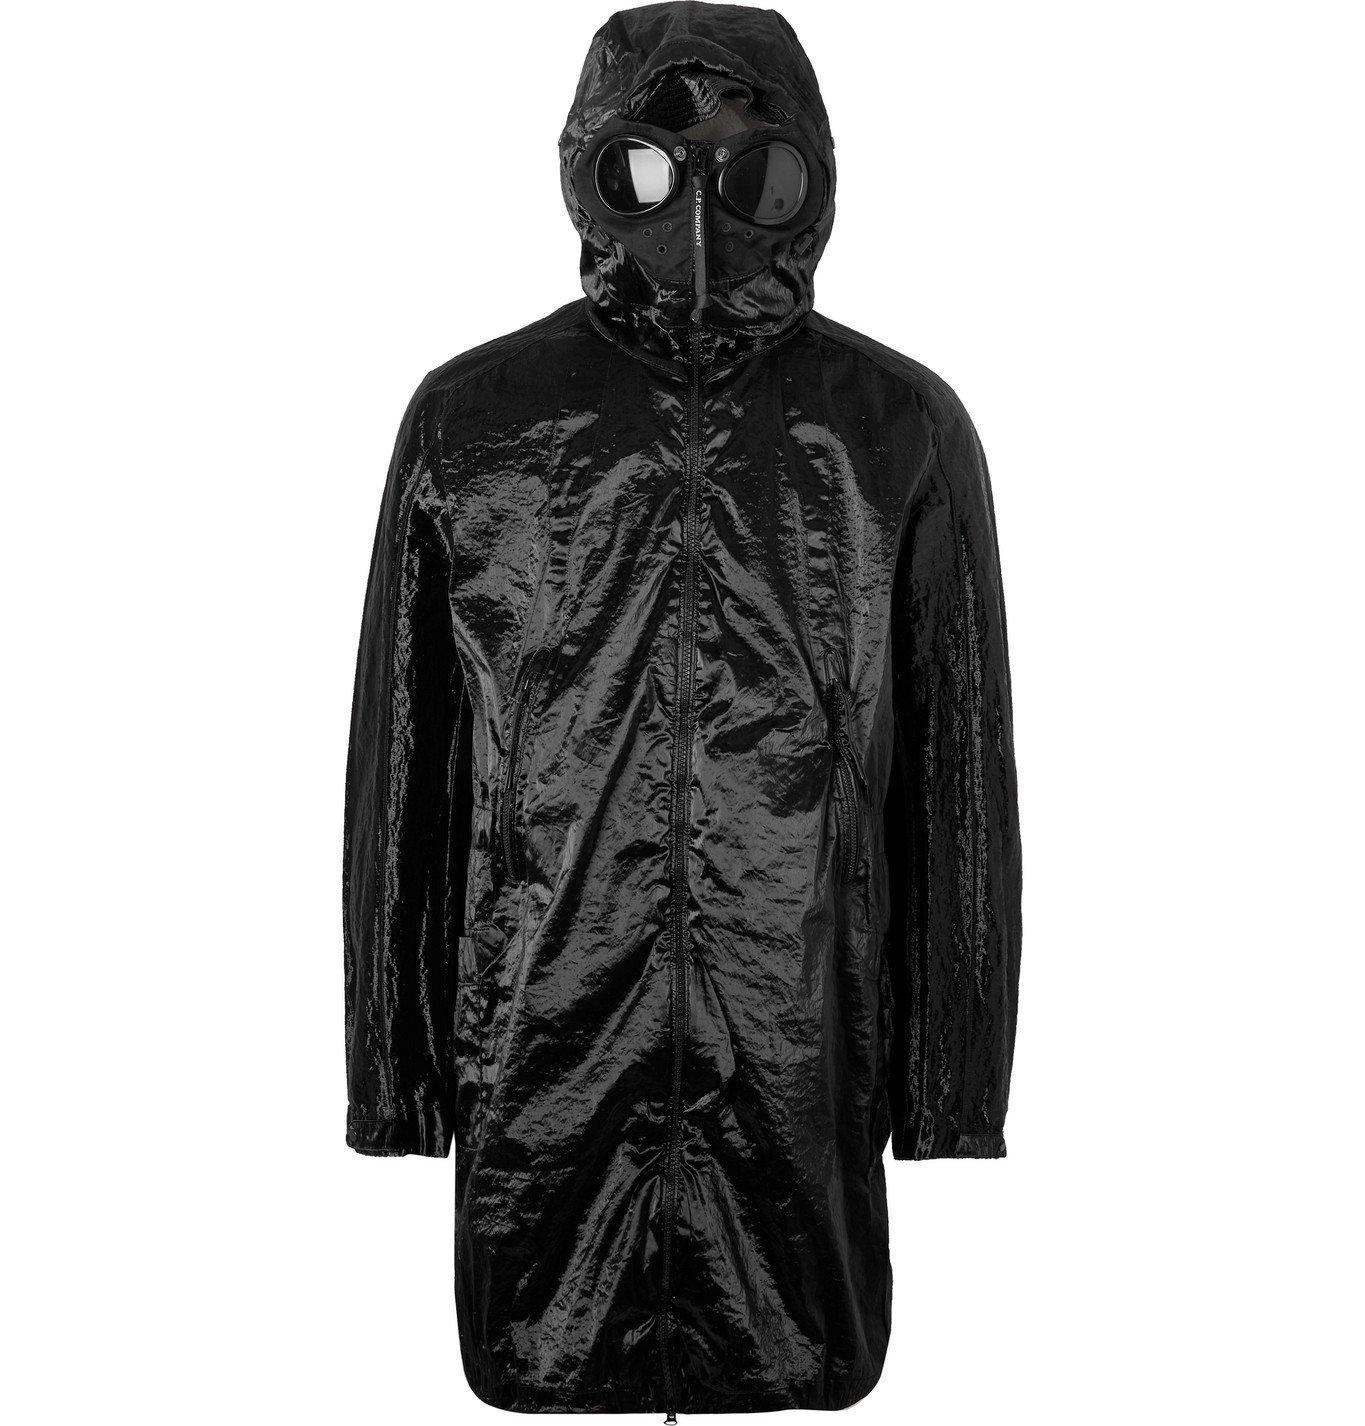 C.P. Company - Kan-D Garment-Dyed Crinkled-Nylon Hooded Parka with Detachable Fleece Liner - Black